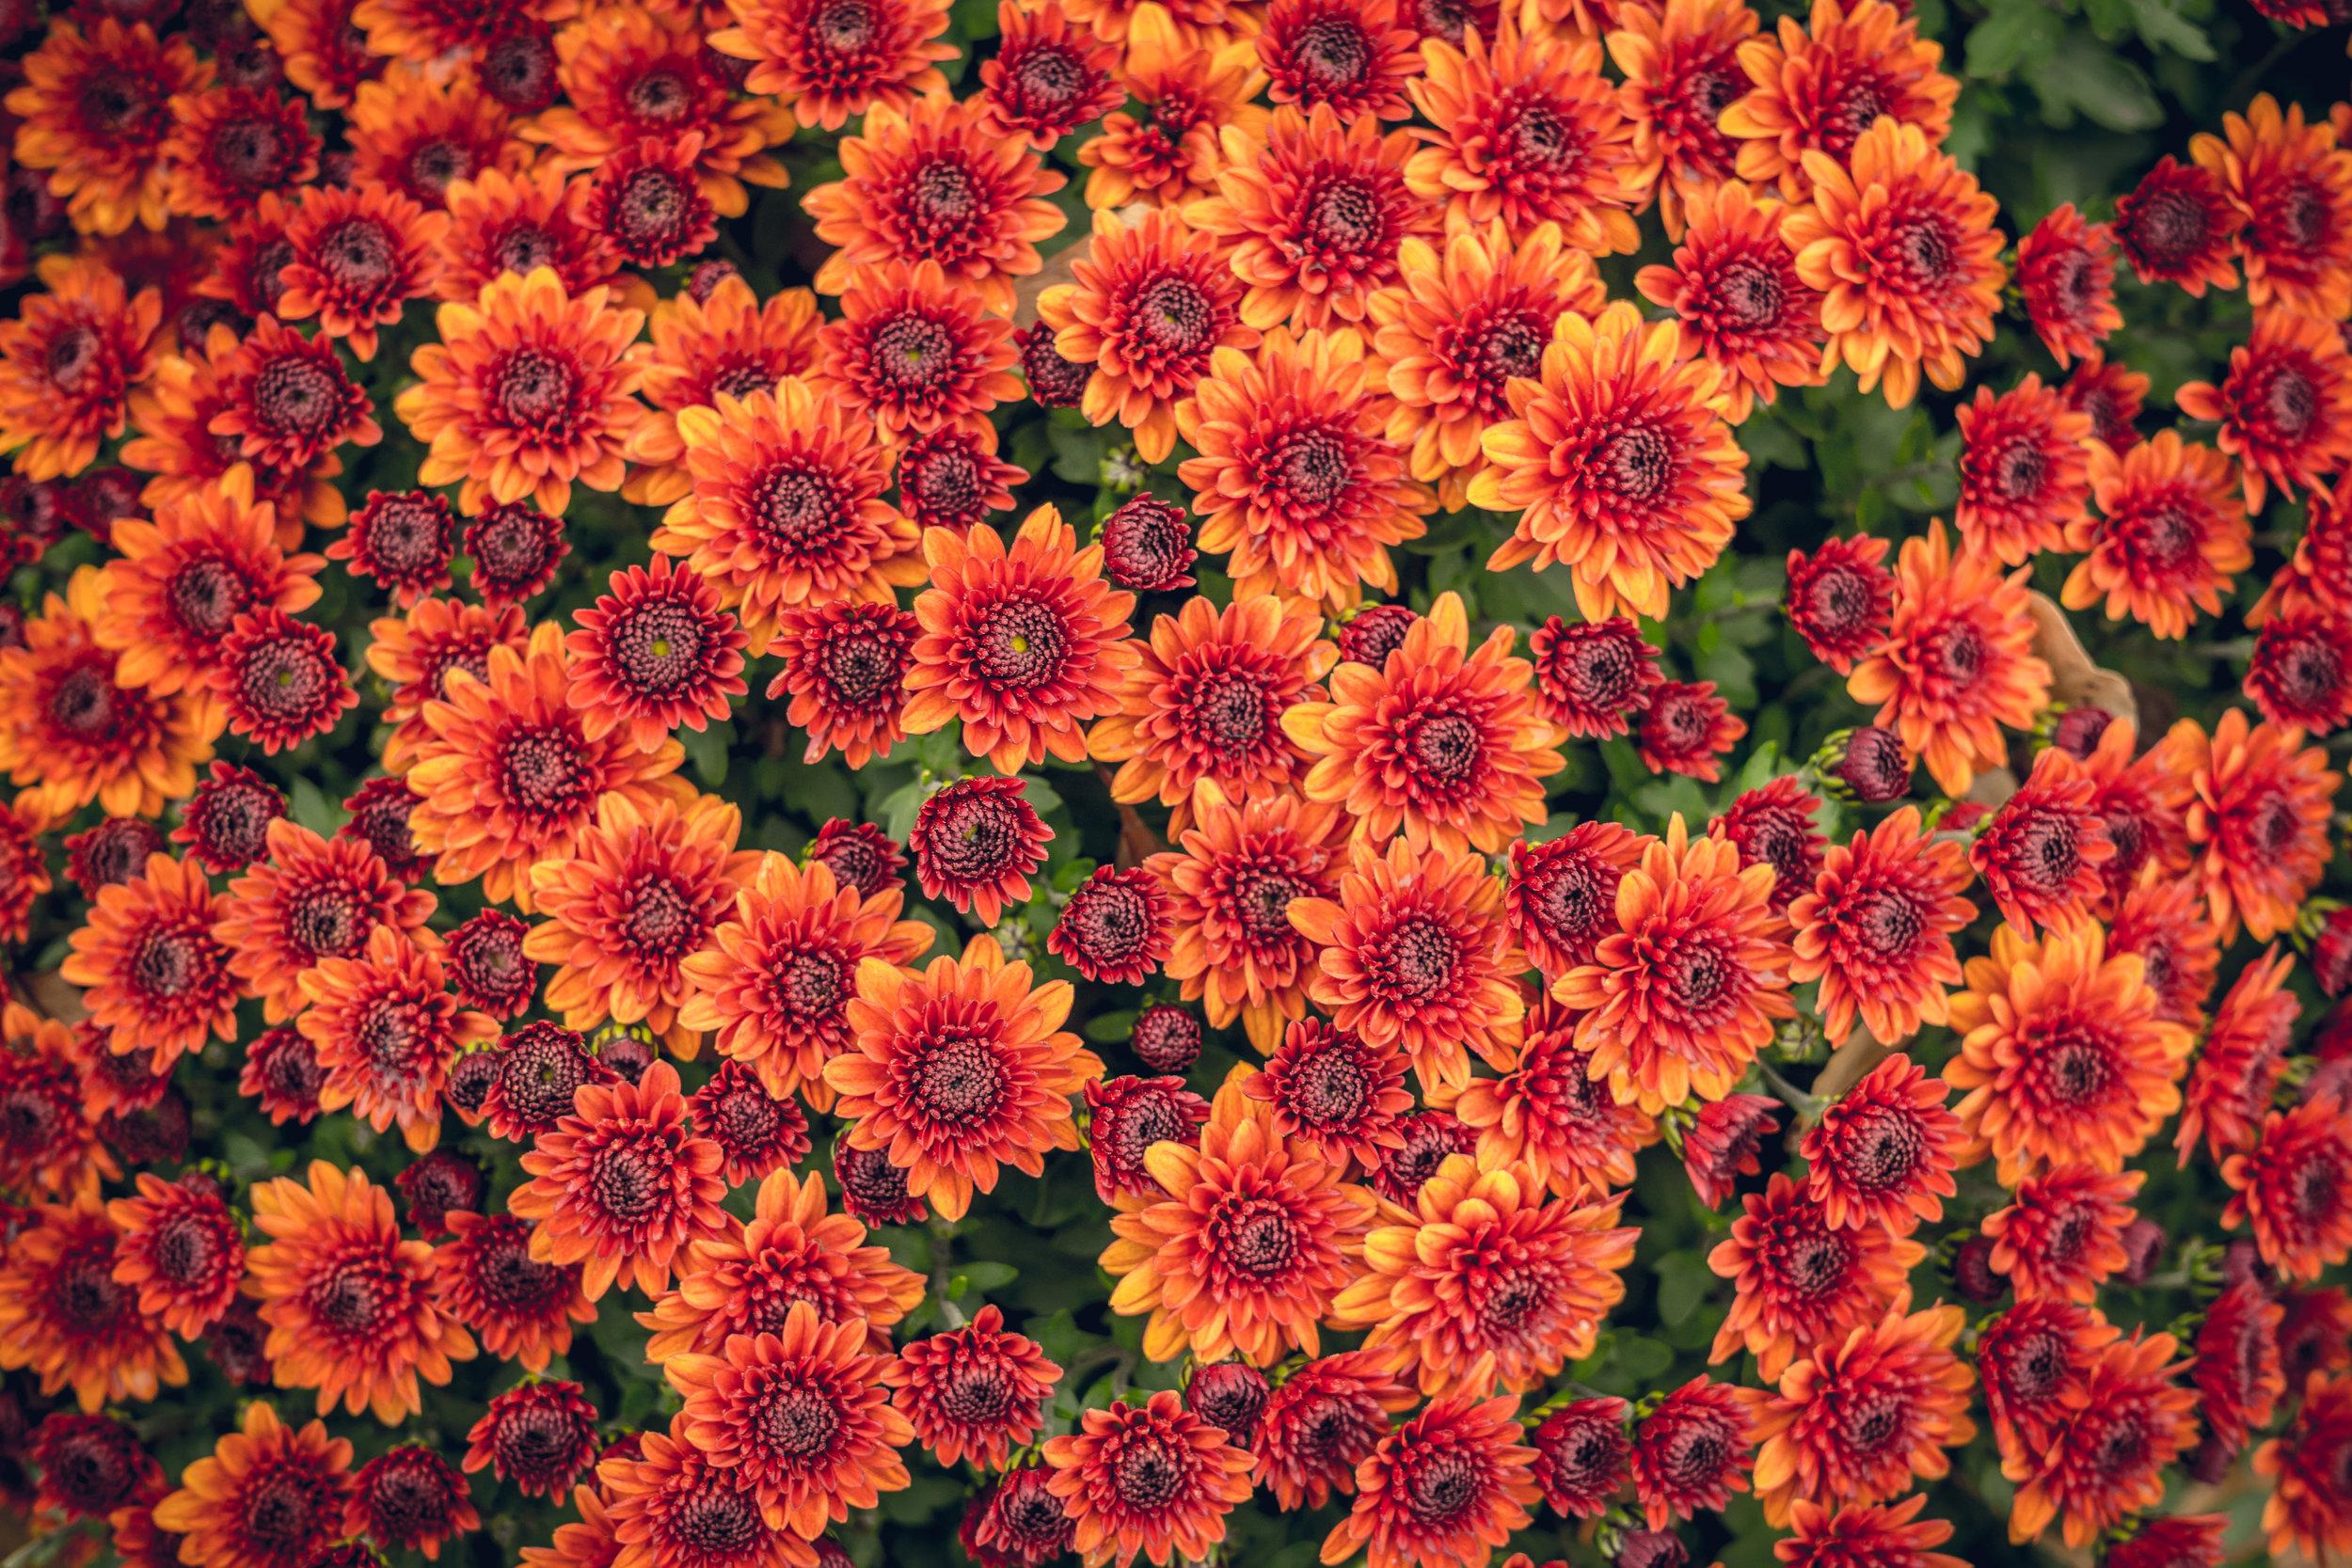 Scenic-autumn-chrysanthemums-615076240_5140x3428.jpeg